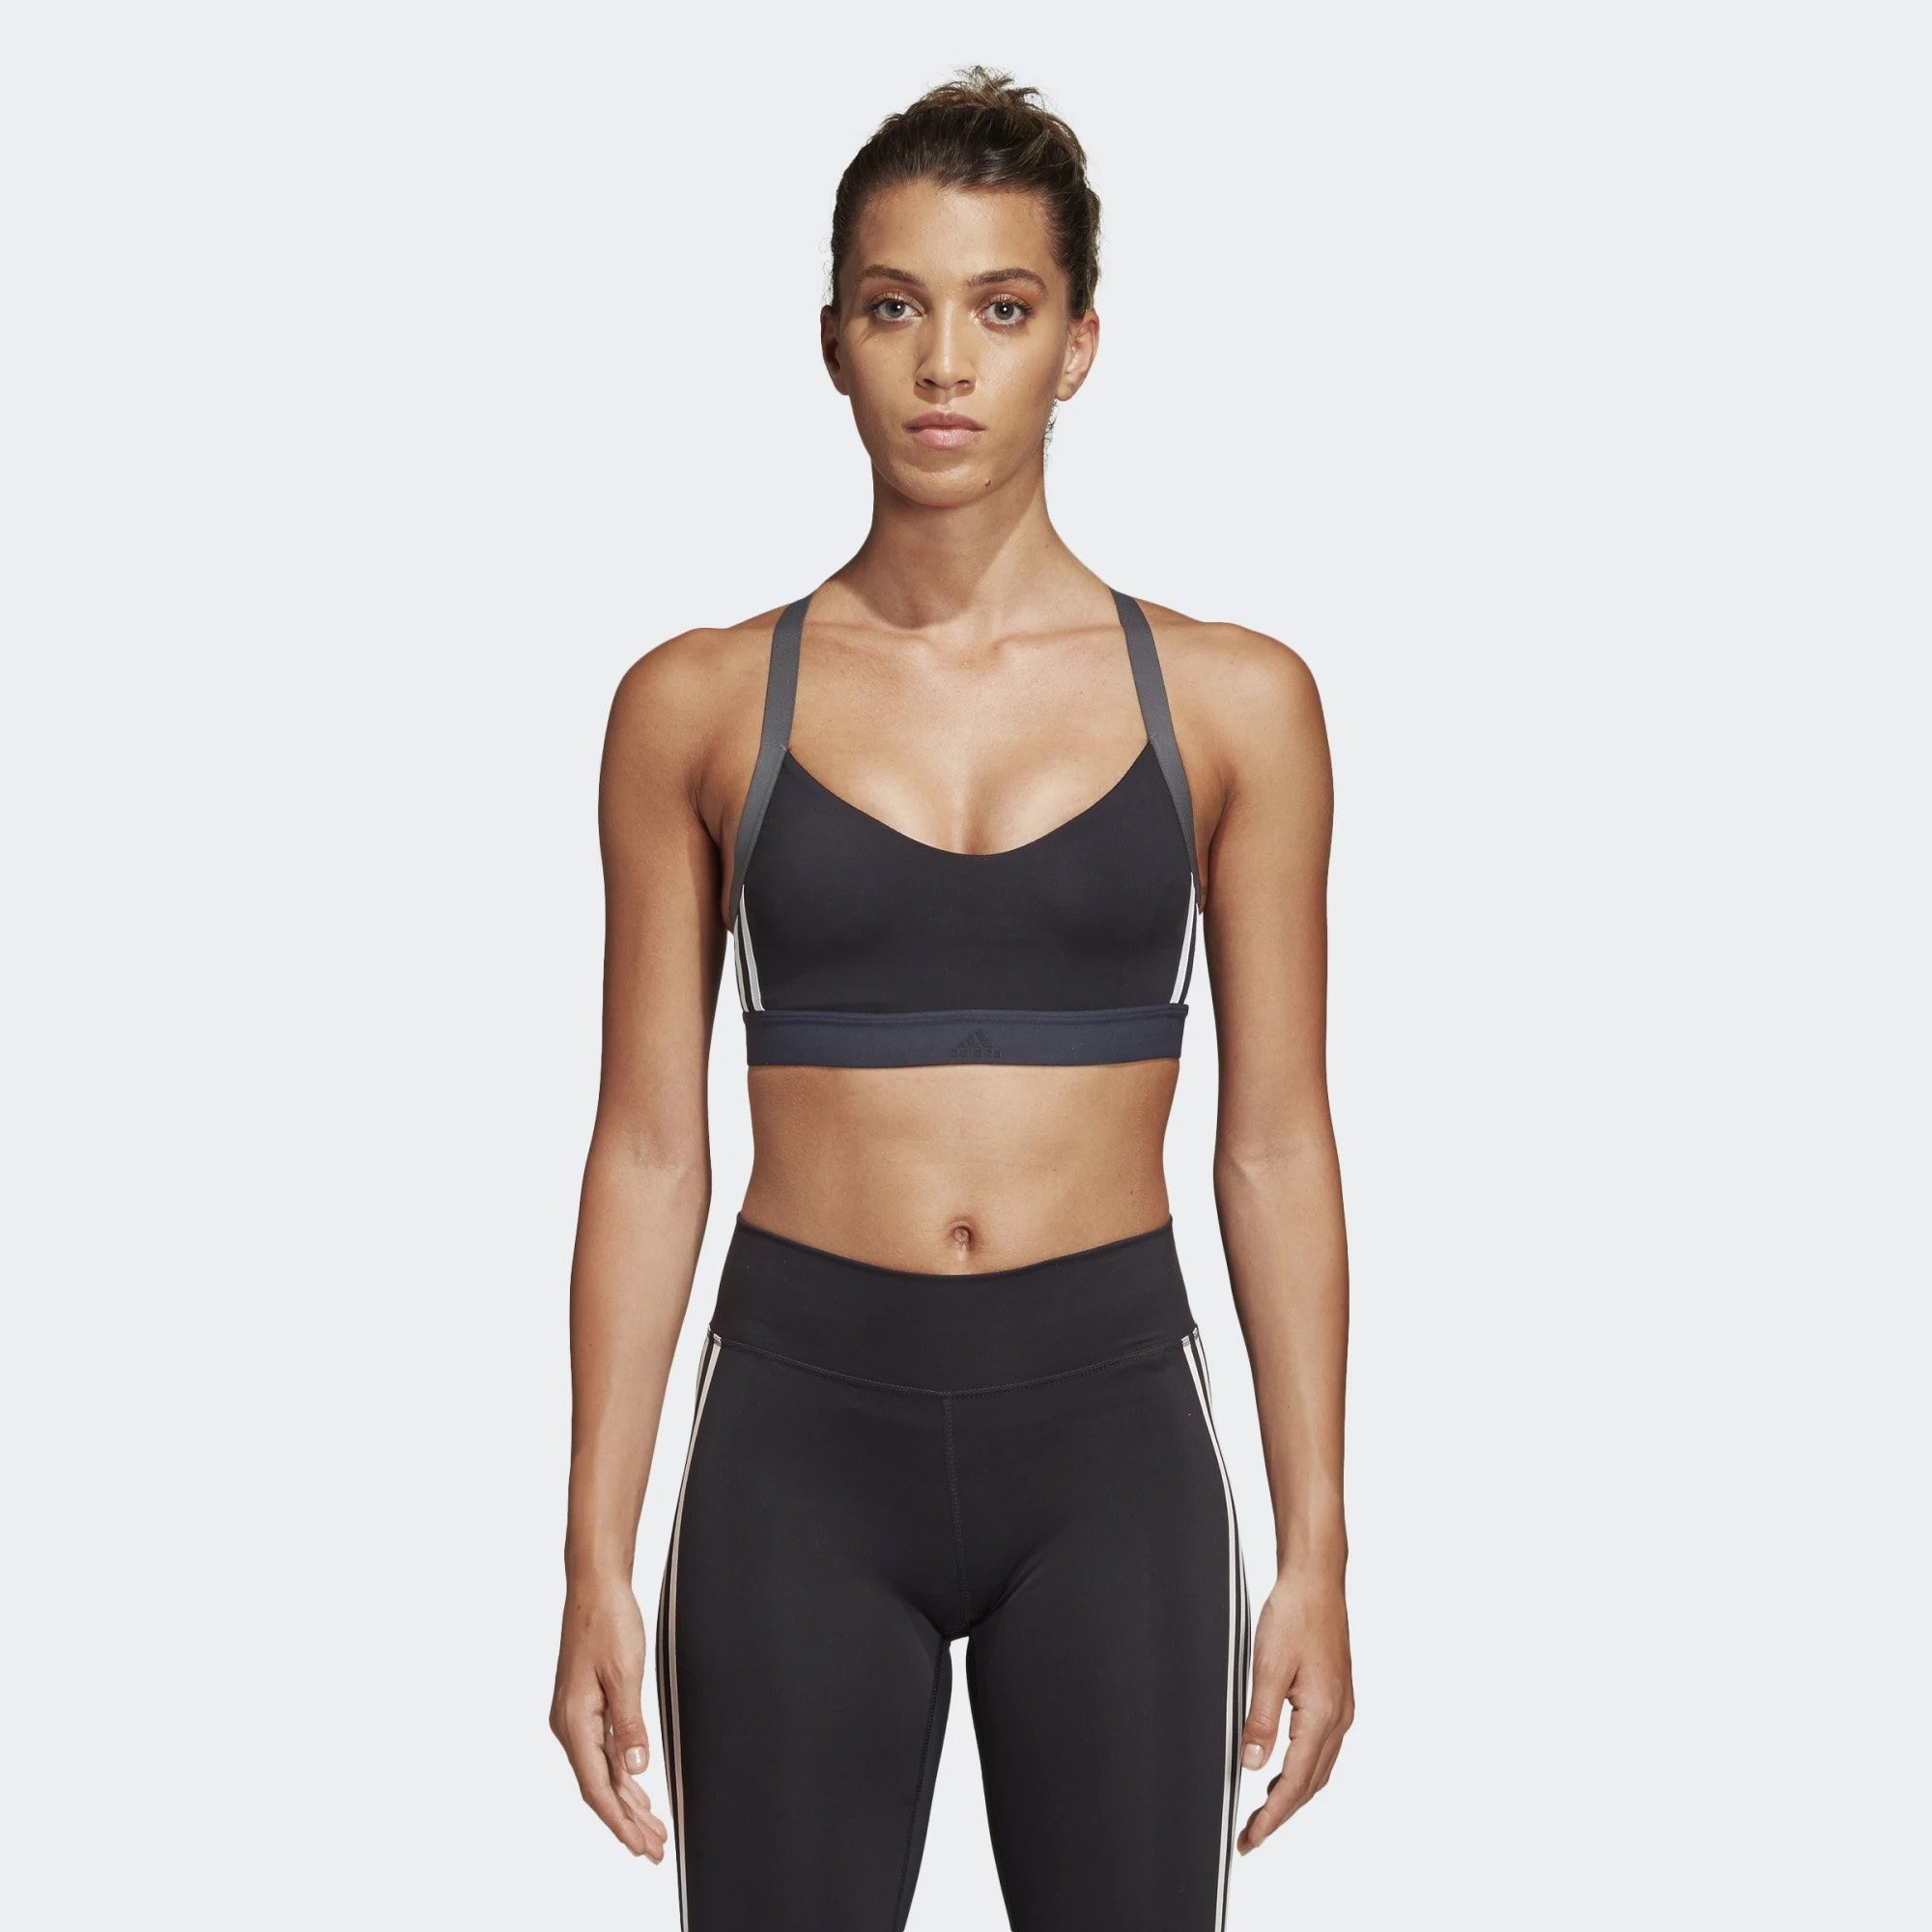 adidas All Me 3-Stripes Women's Bra – Γυναικείο Μπουστάκι (9000023552_1469)